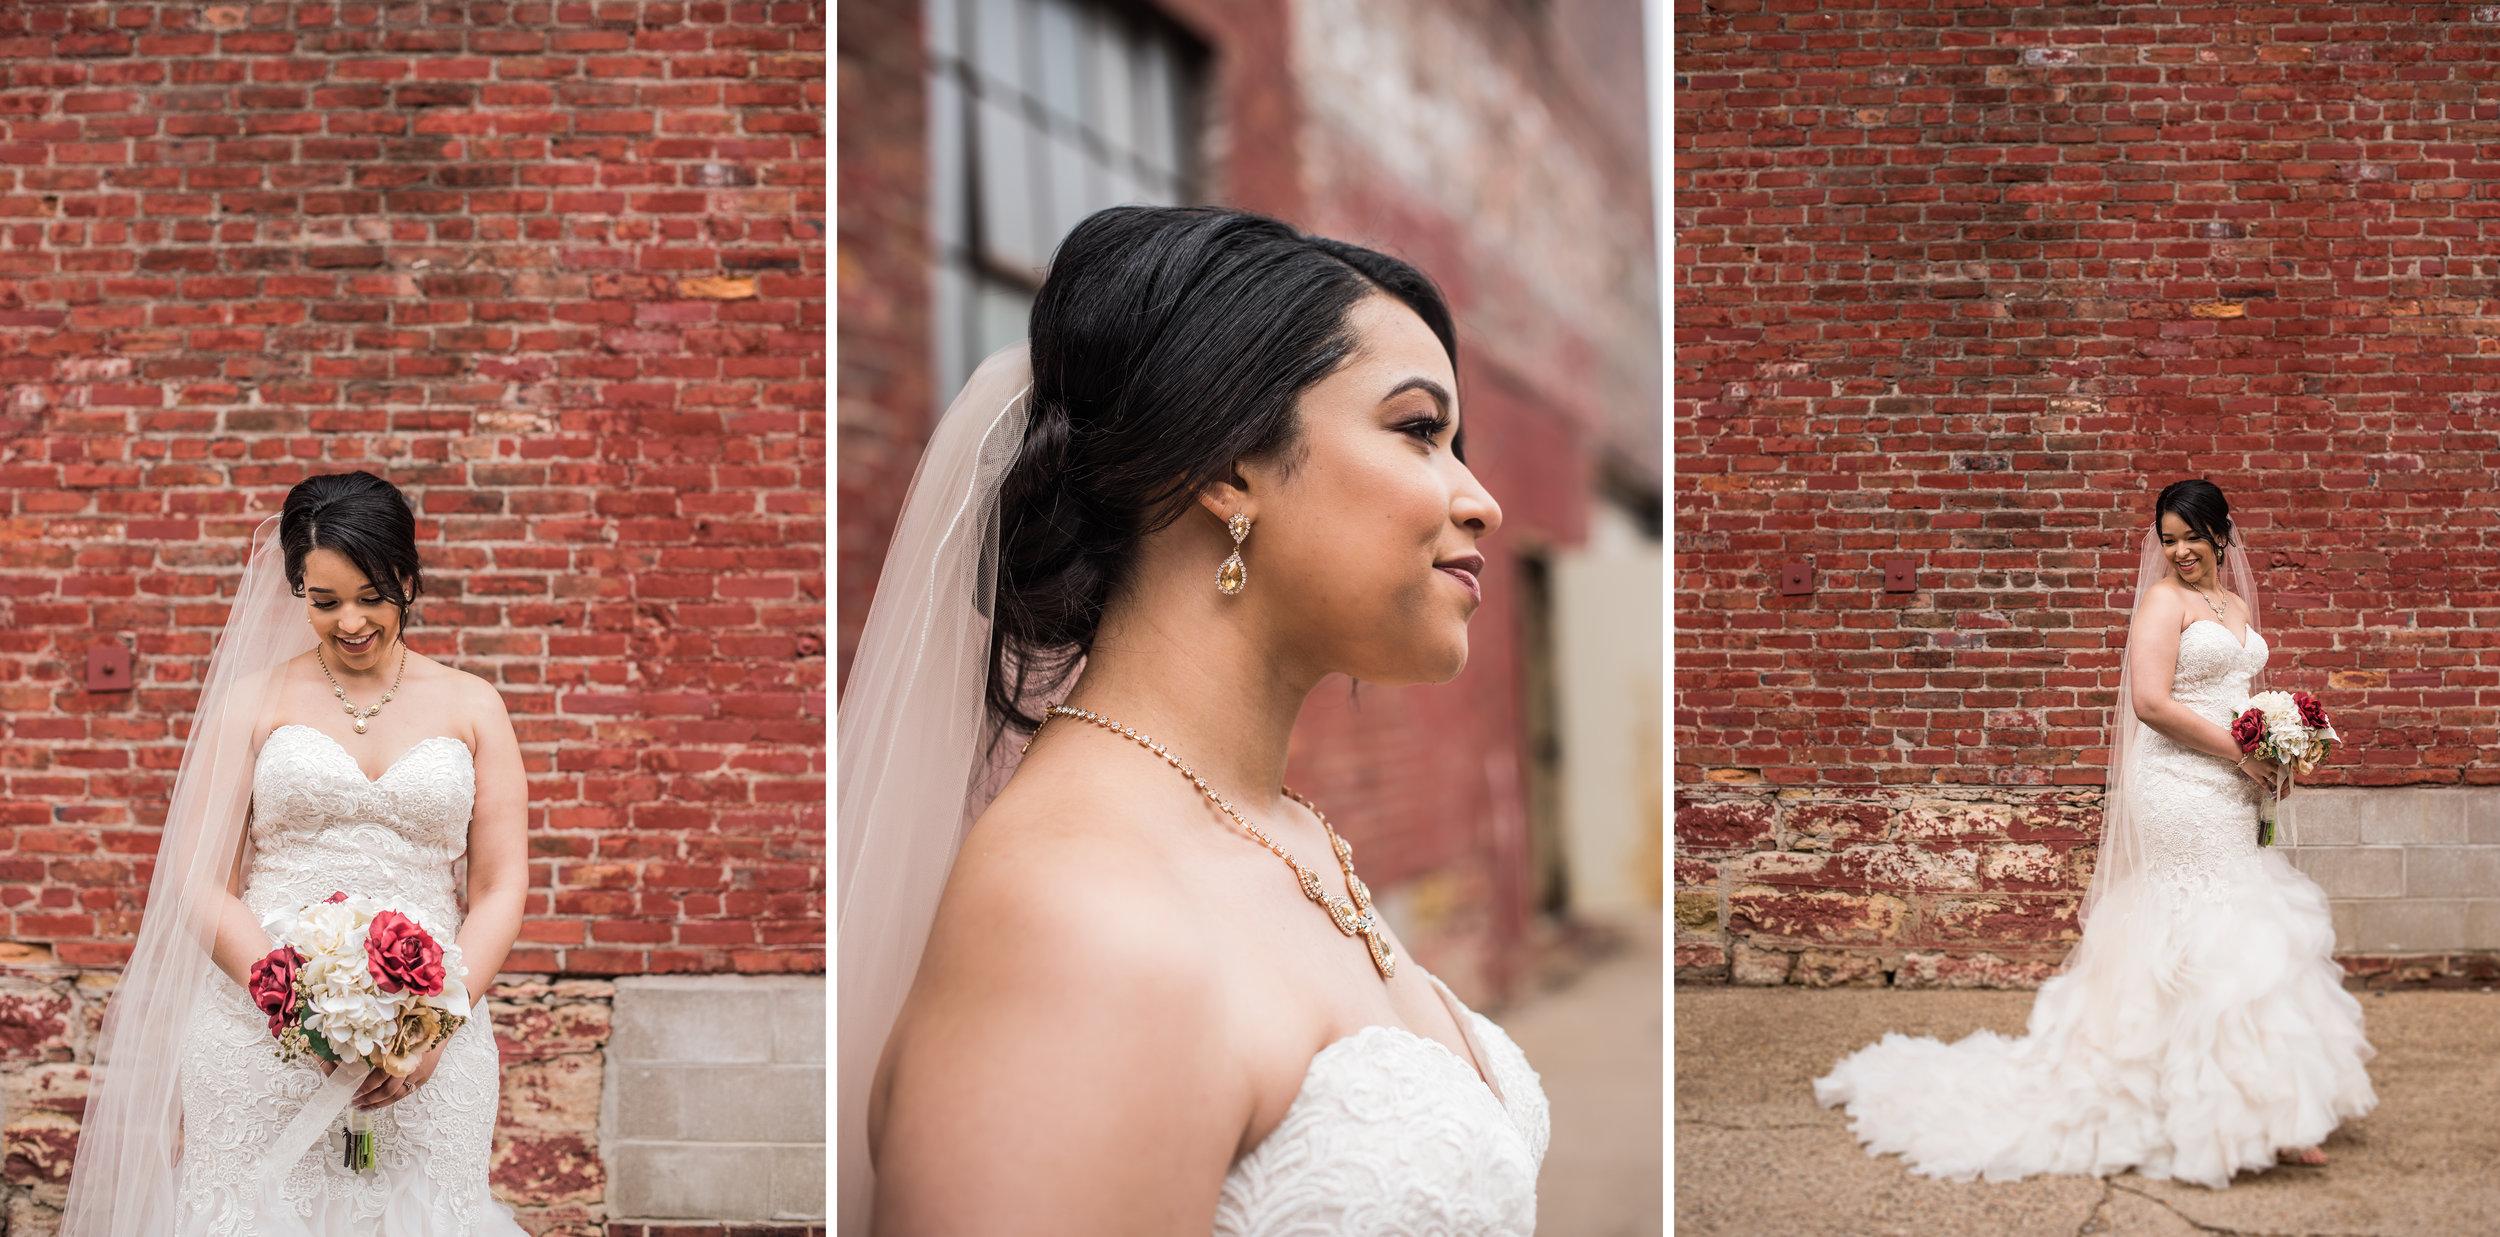 Burlington Iowa Wedding Midwest Photographer Melissa Cervantes _ Chantelle and Isaiah 243.jpg